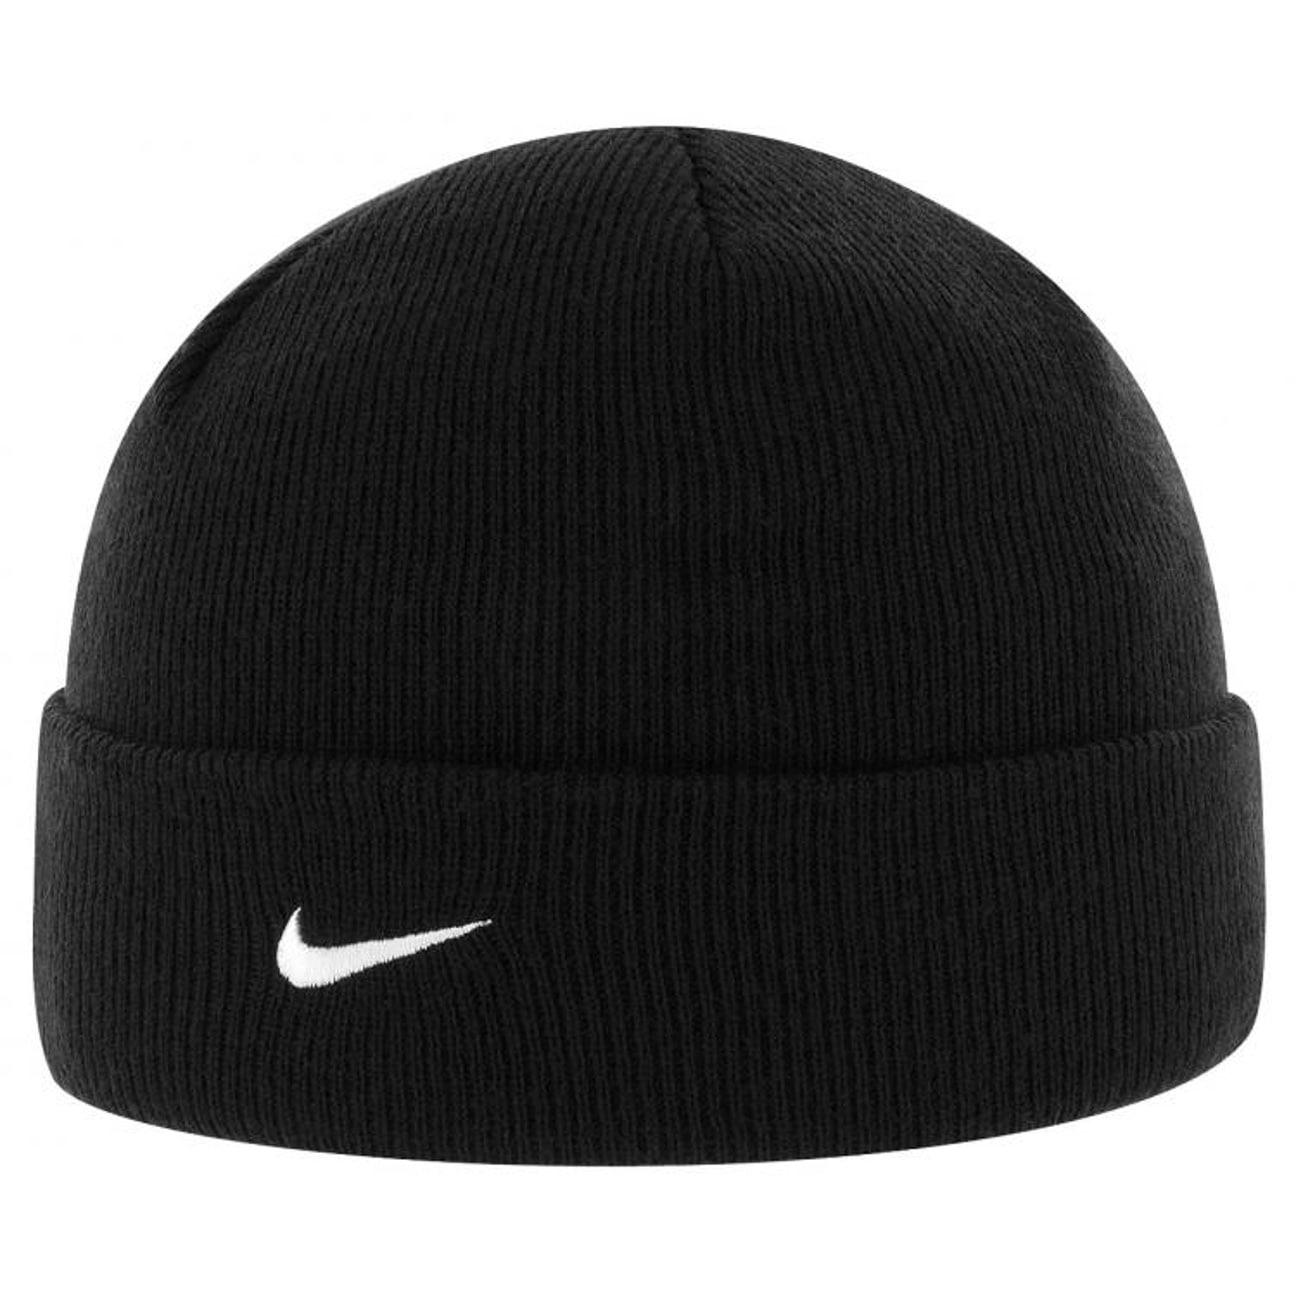 Prolong Chapeaux En Eur By Tricot Bonnet Nike Youth 9 gt; 95 OxwgqnZ